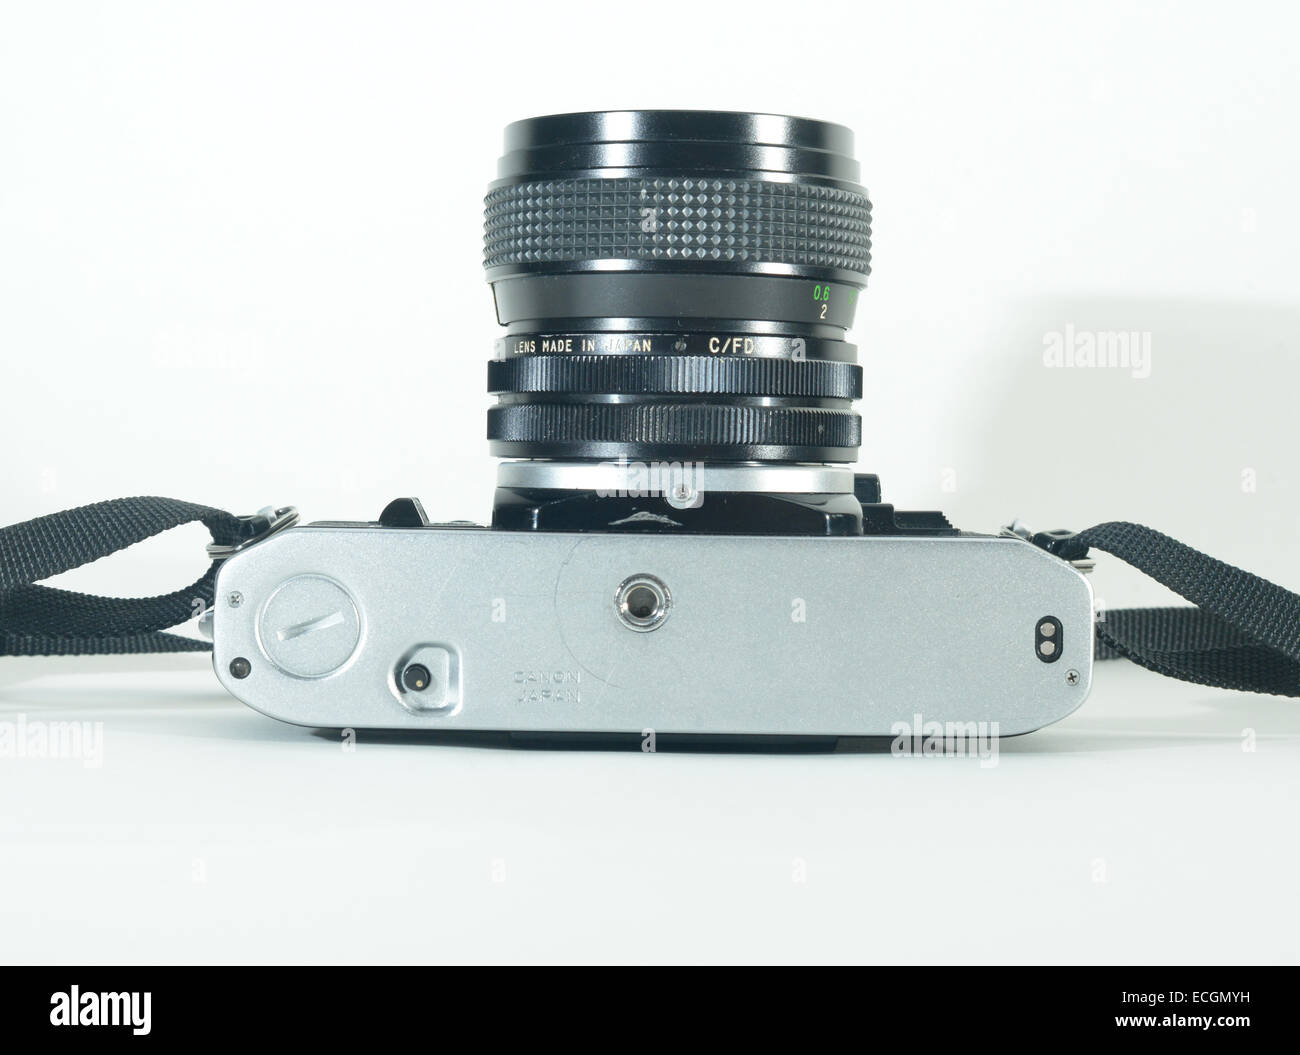 Canon AE1 SLR manual film camera Stock Photo